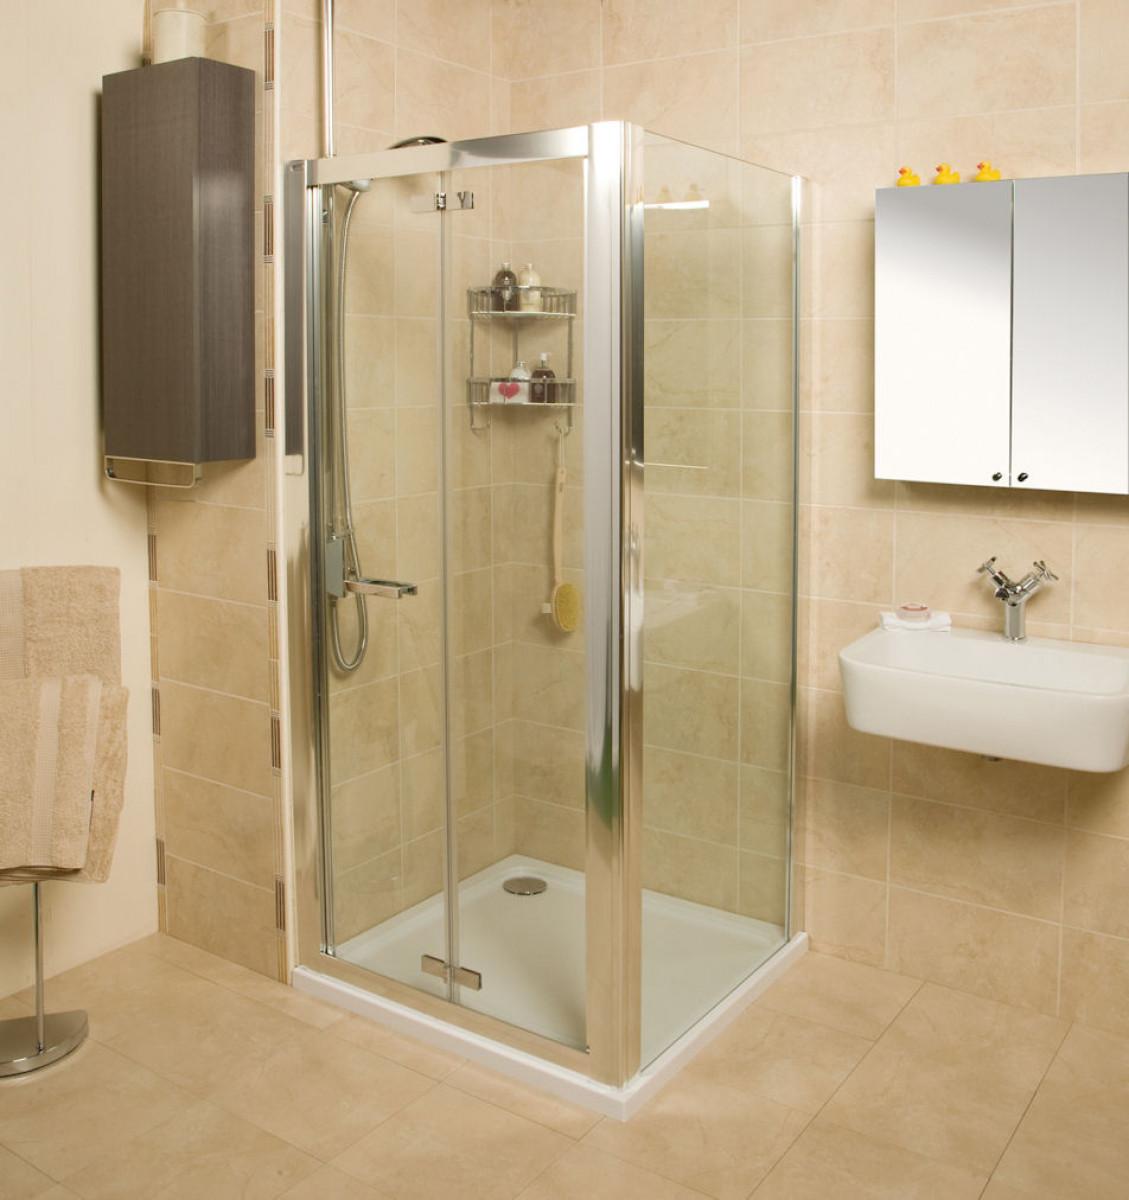 Roman embrace 900mm bi fold shower door for 1200mm bi fold shower door